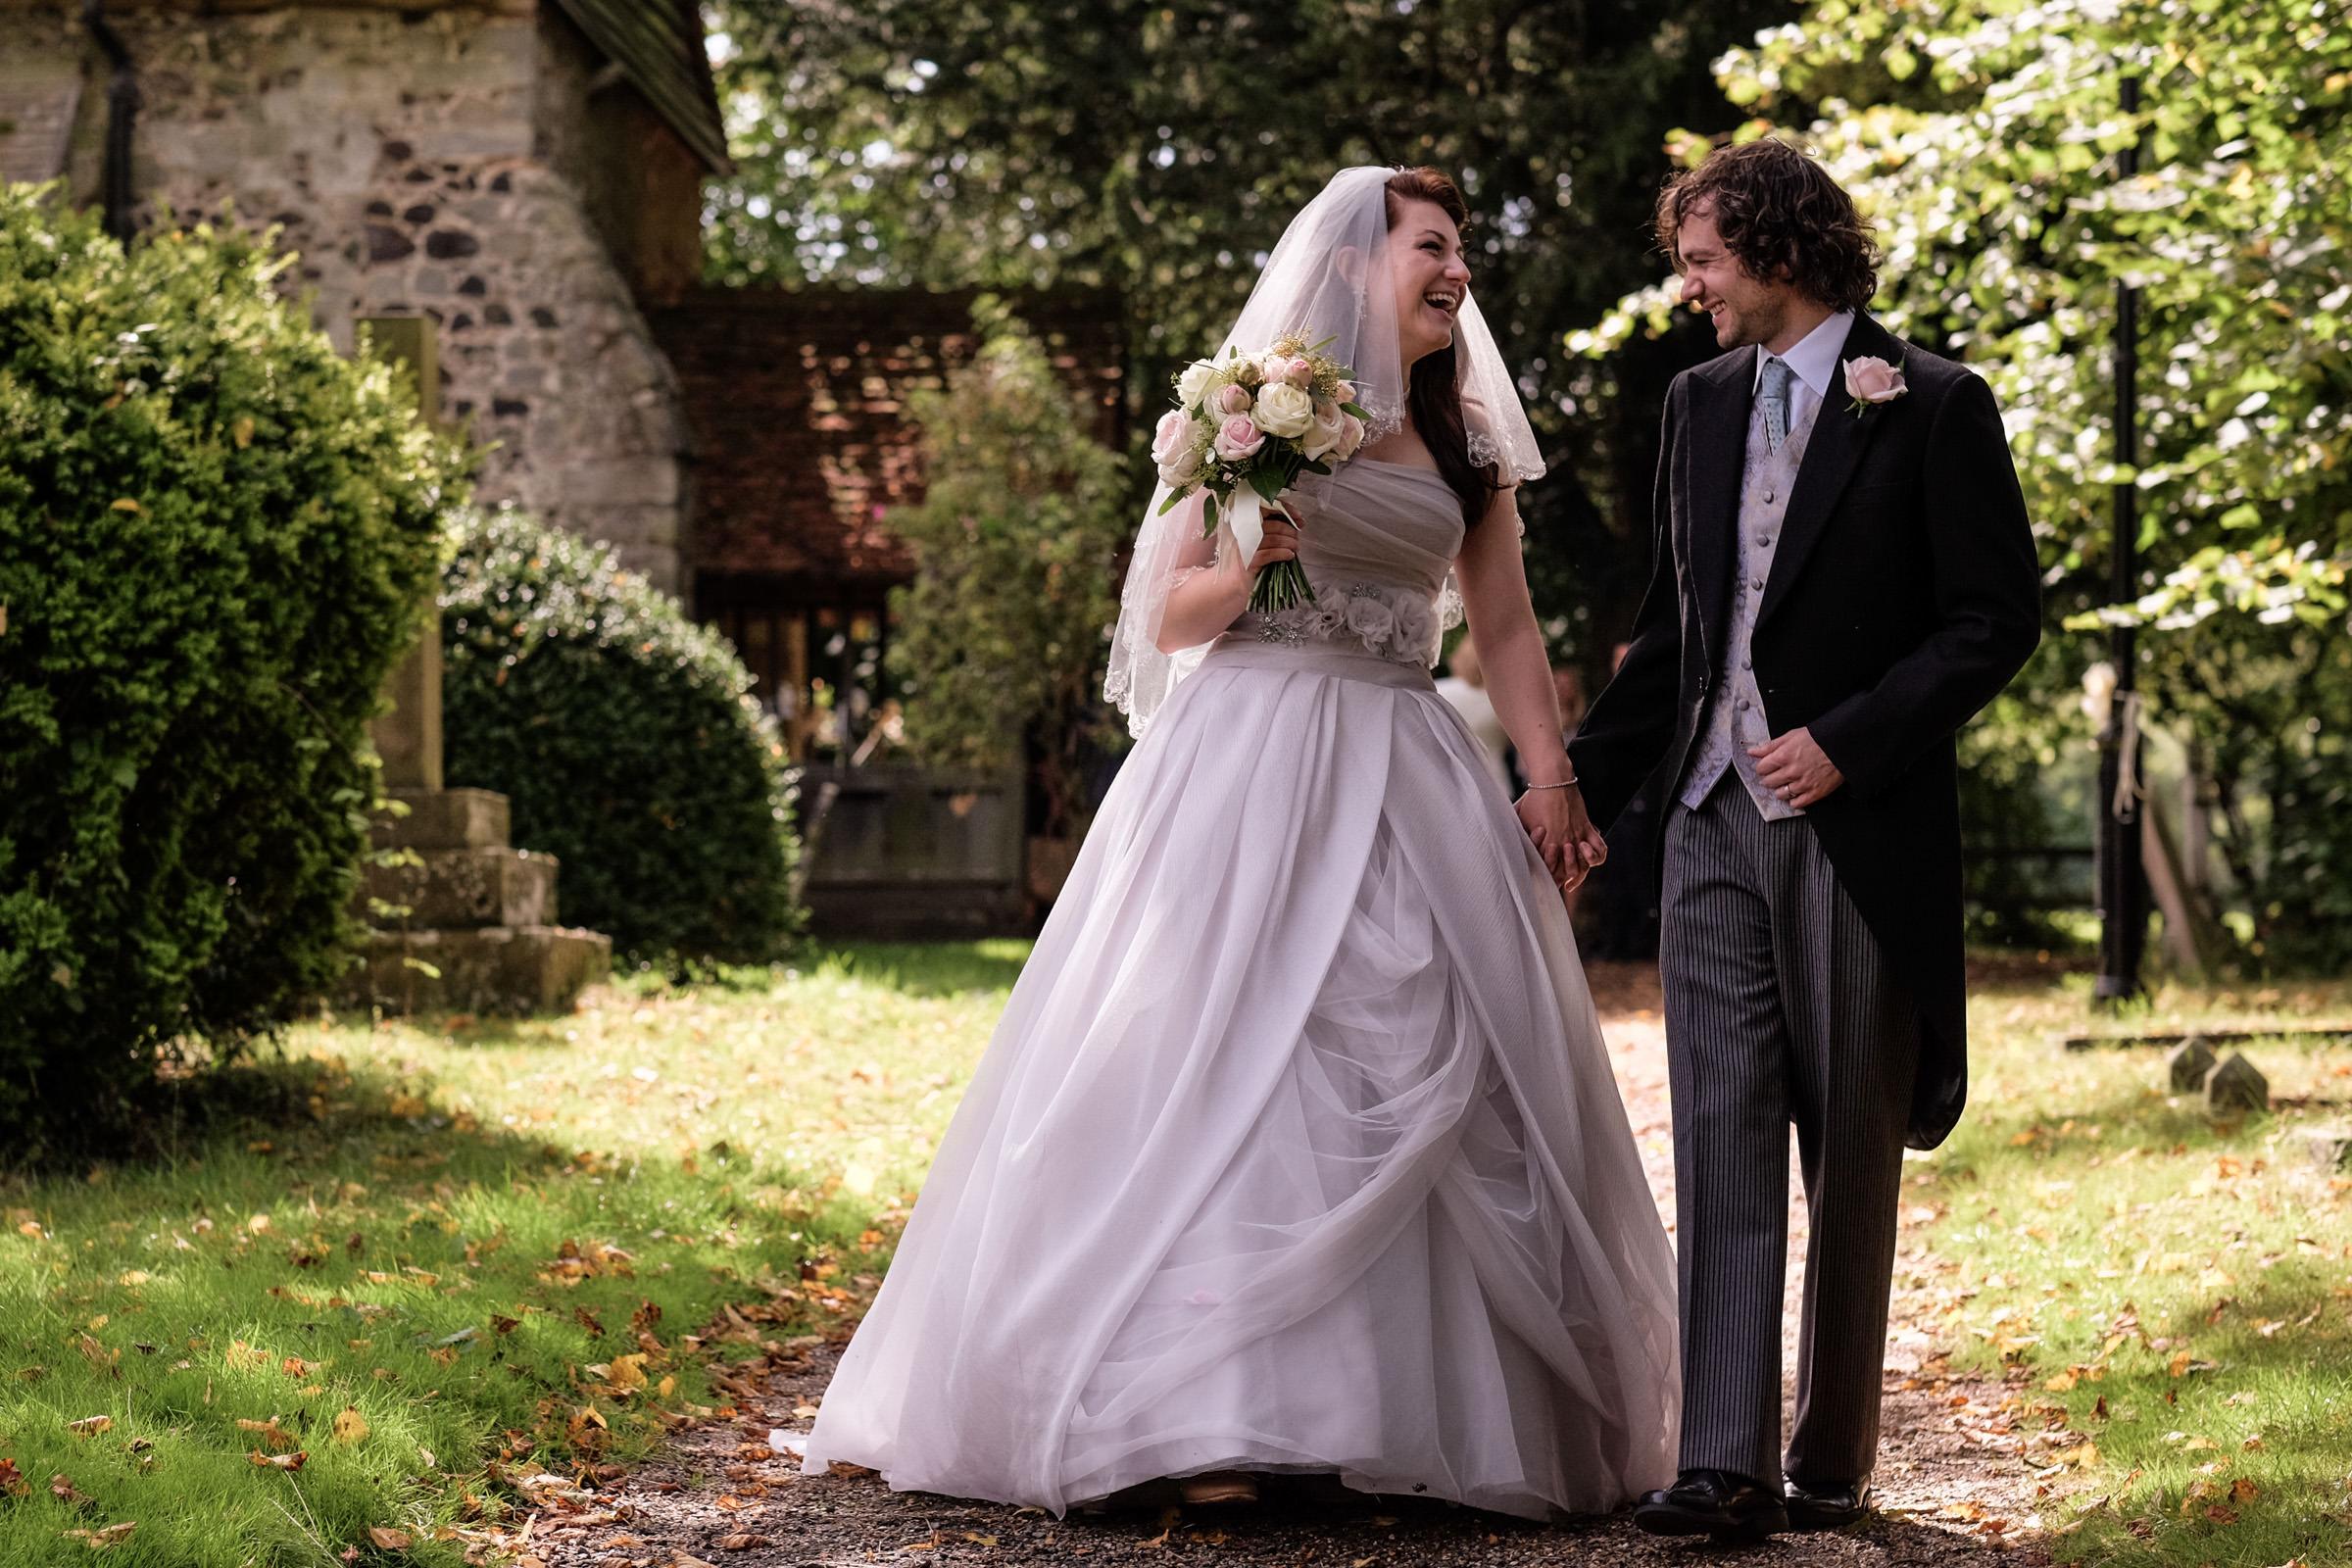 Wedding at De Vere Gorse Hill in Surrey 017.jpg